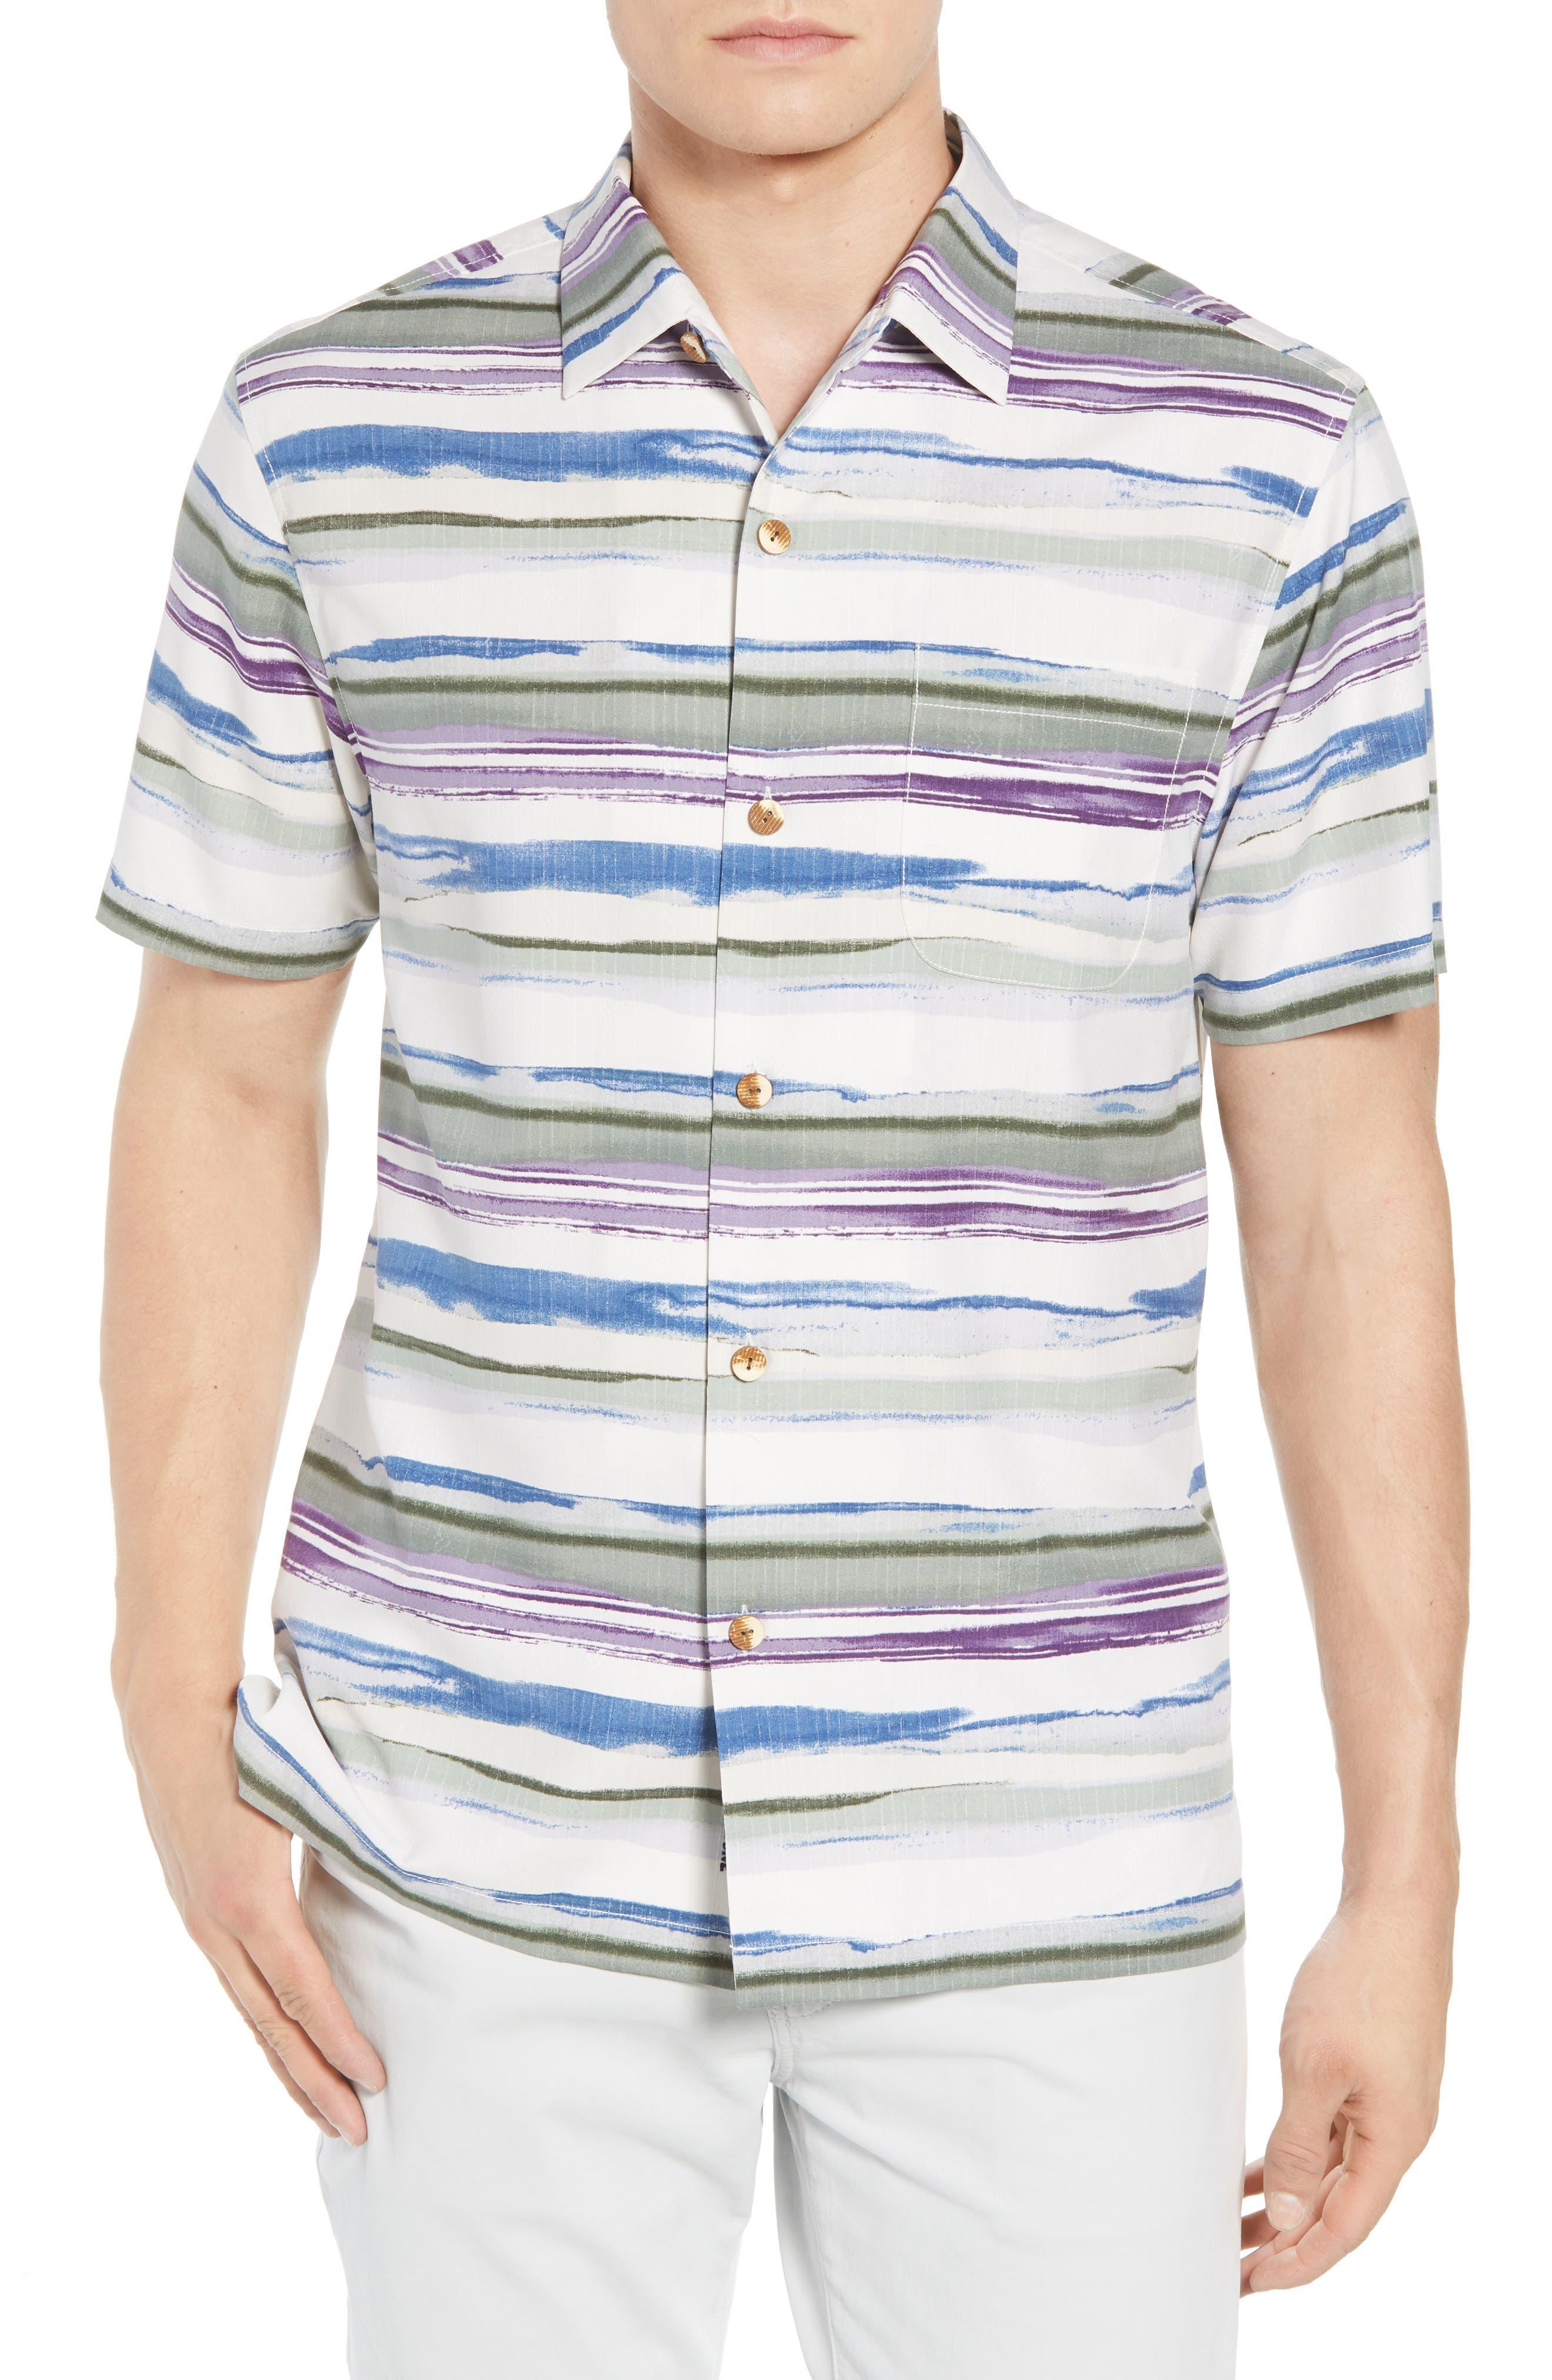 Hazy Horizons Silk Blend Camp Shirt,                             Main thumbnail 1, color,                             300